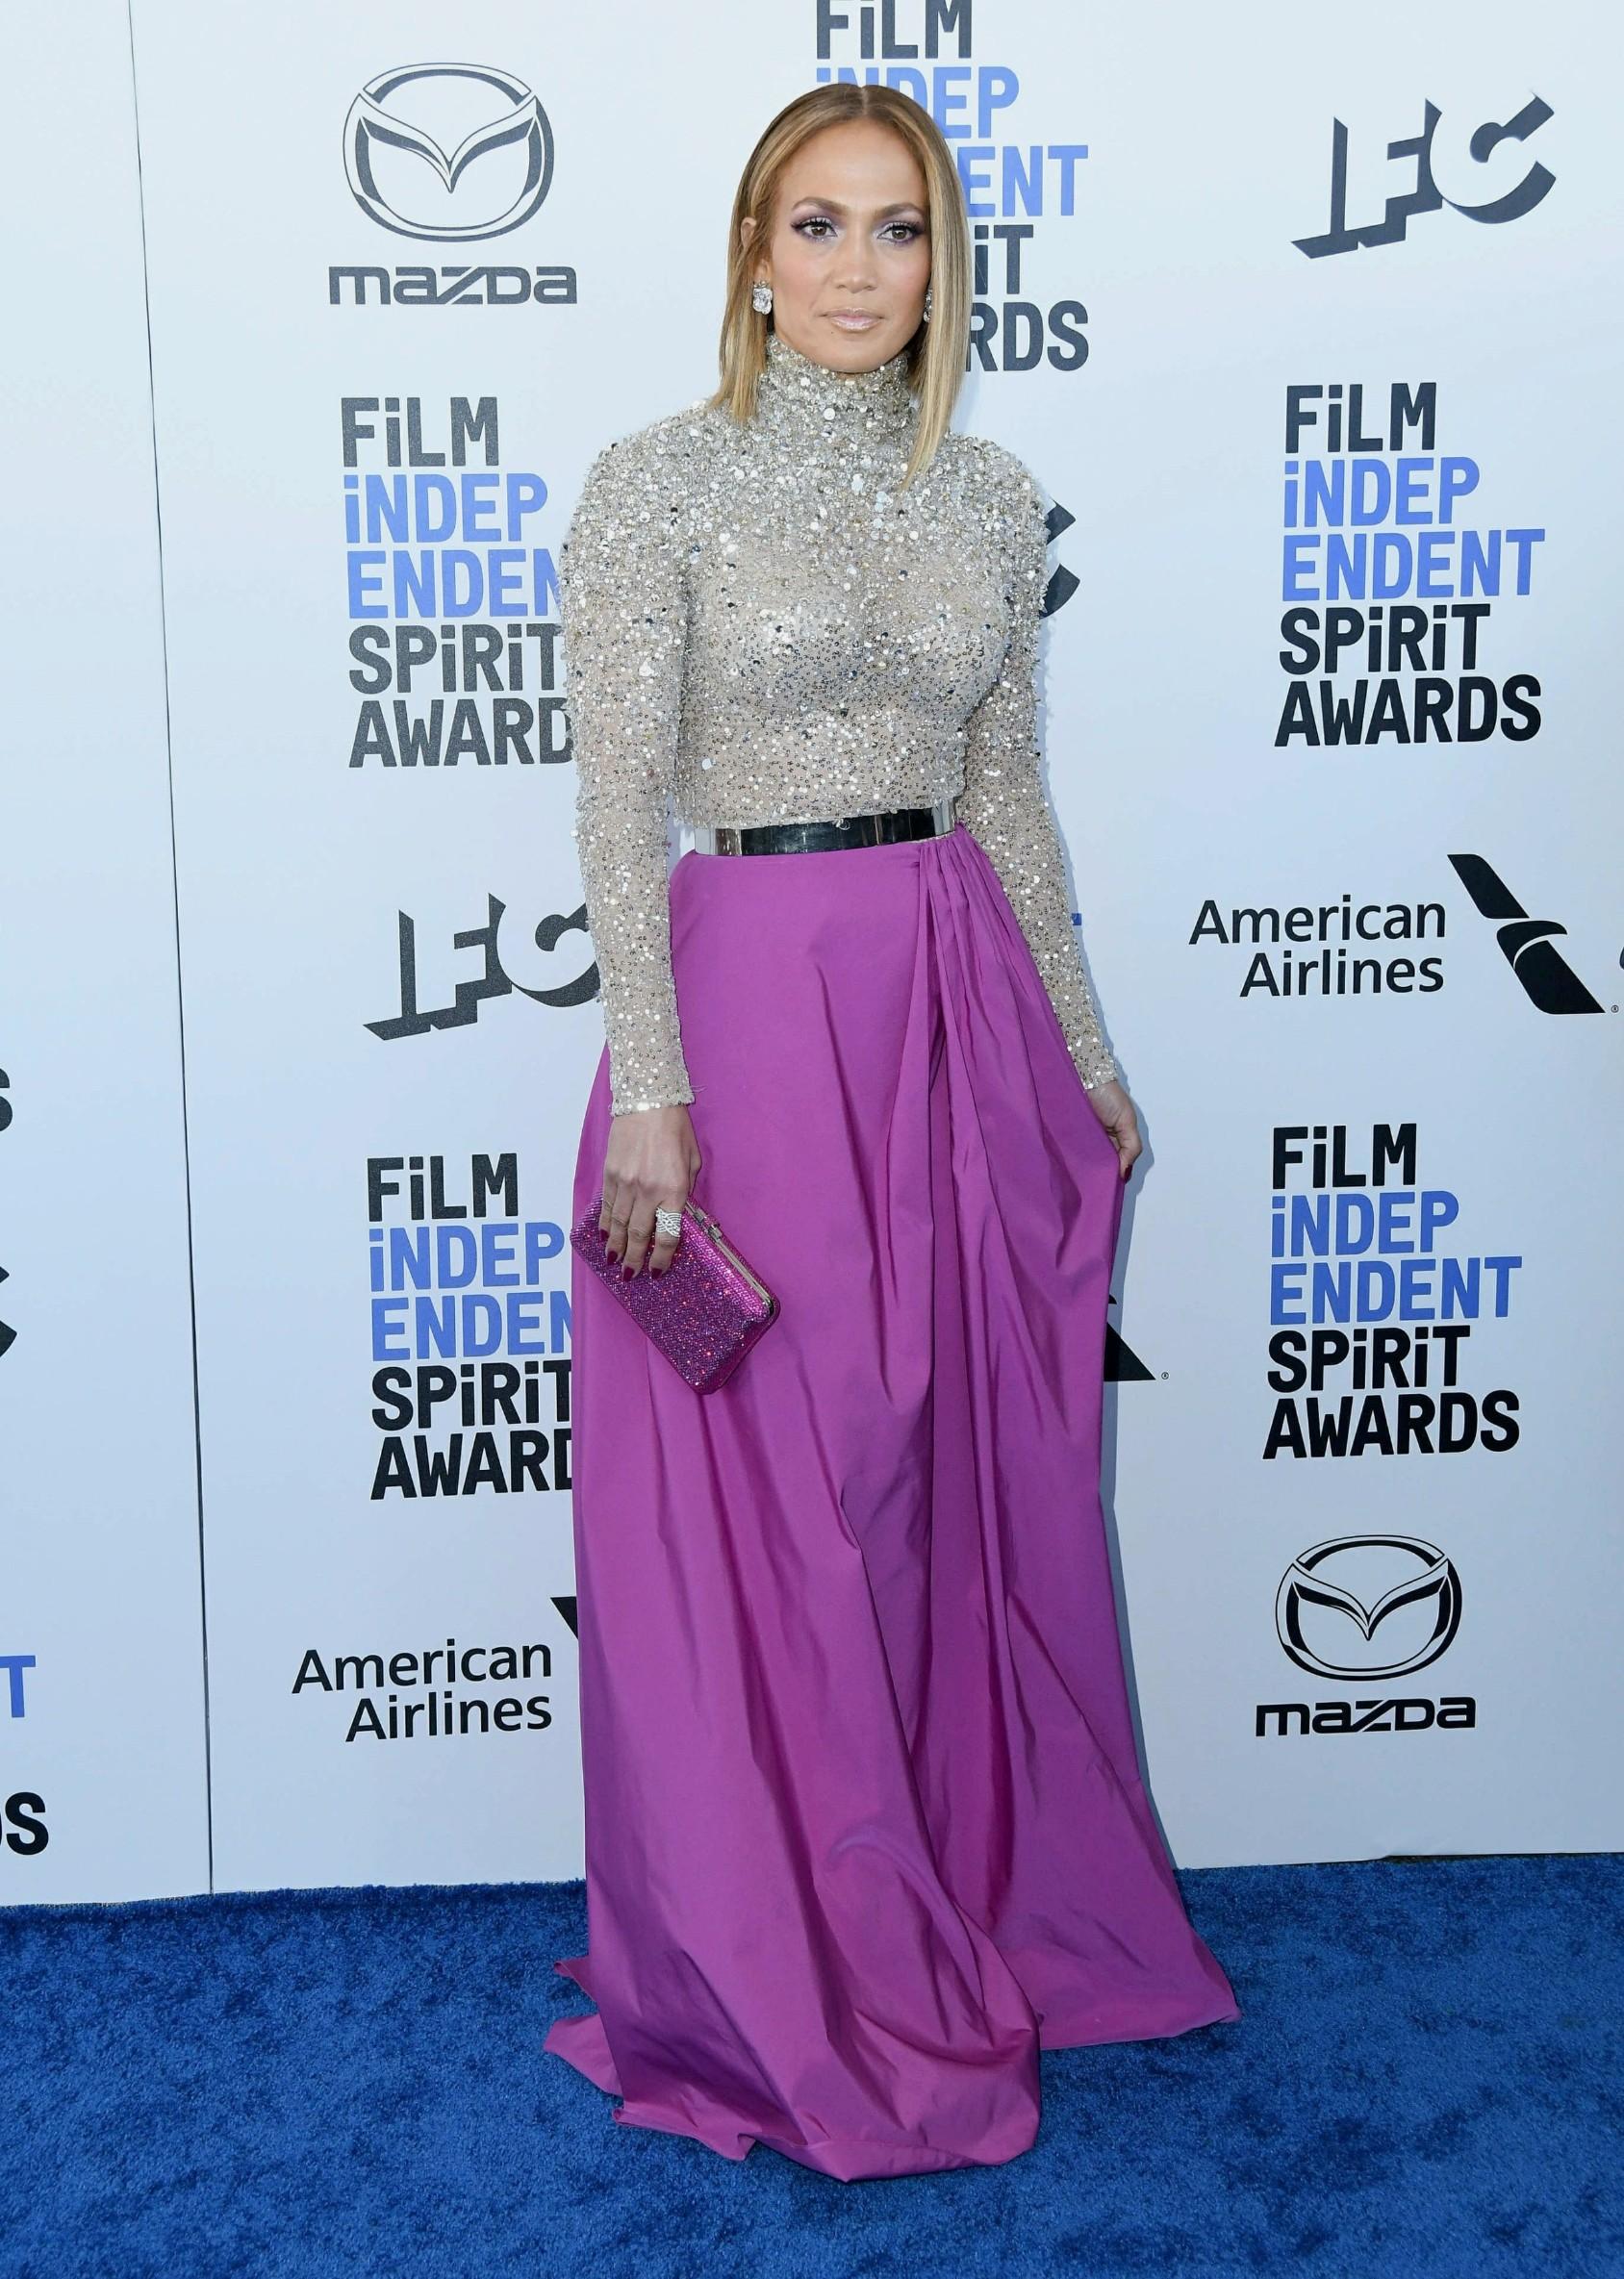 , Santa Monica , CA - 20200208 2020 Film Independent Spirit Awards - Arrivals.   -PICTURED: Jennifer Lopez -, Image: 497328412, License: Rights-managed, Restrictions: , Model Release: no, Credit line: Thompson/AdMedia/Media Punch / INSTAR Images / Profimedia